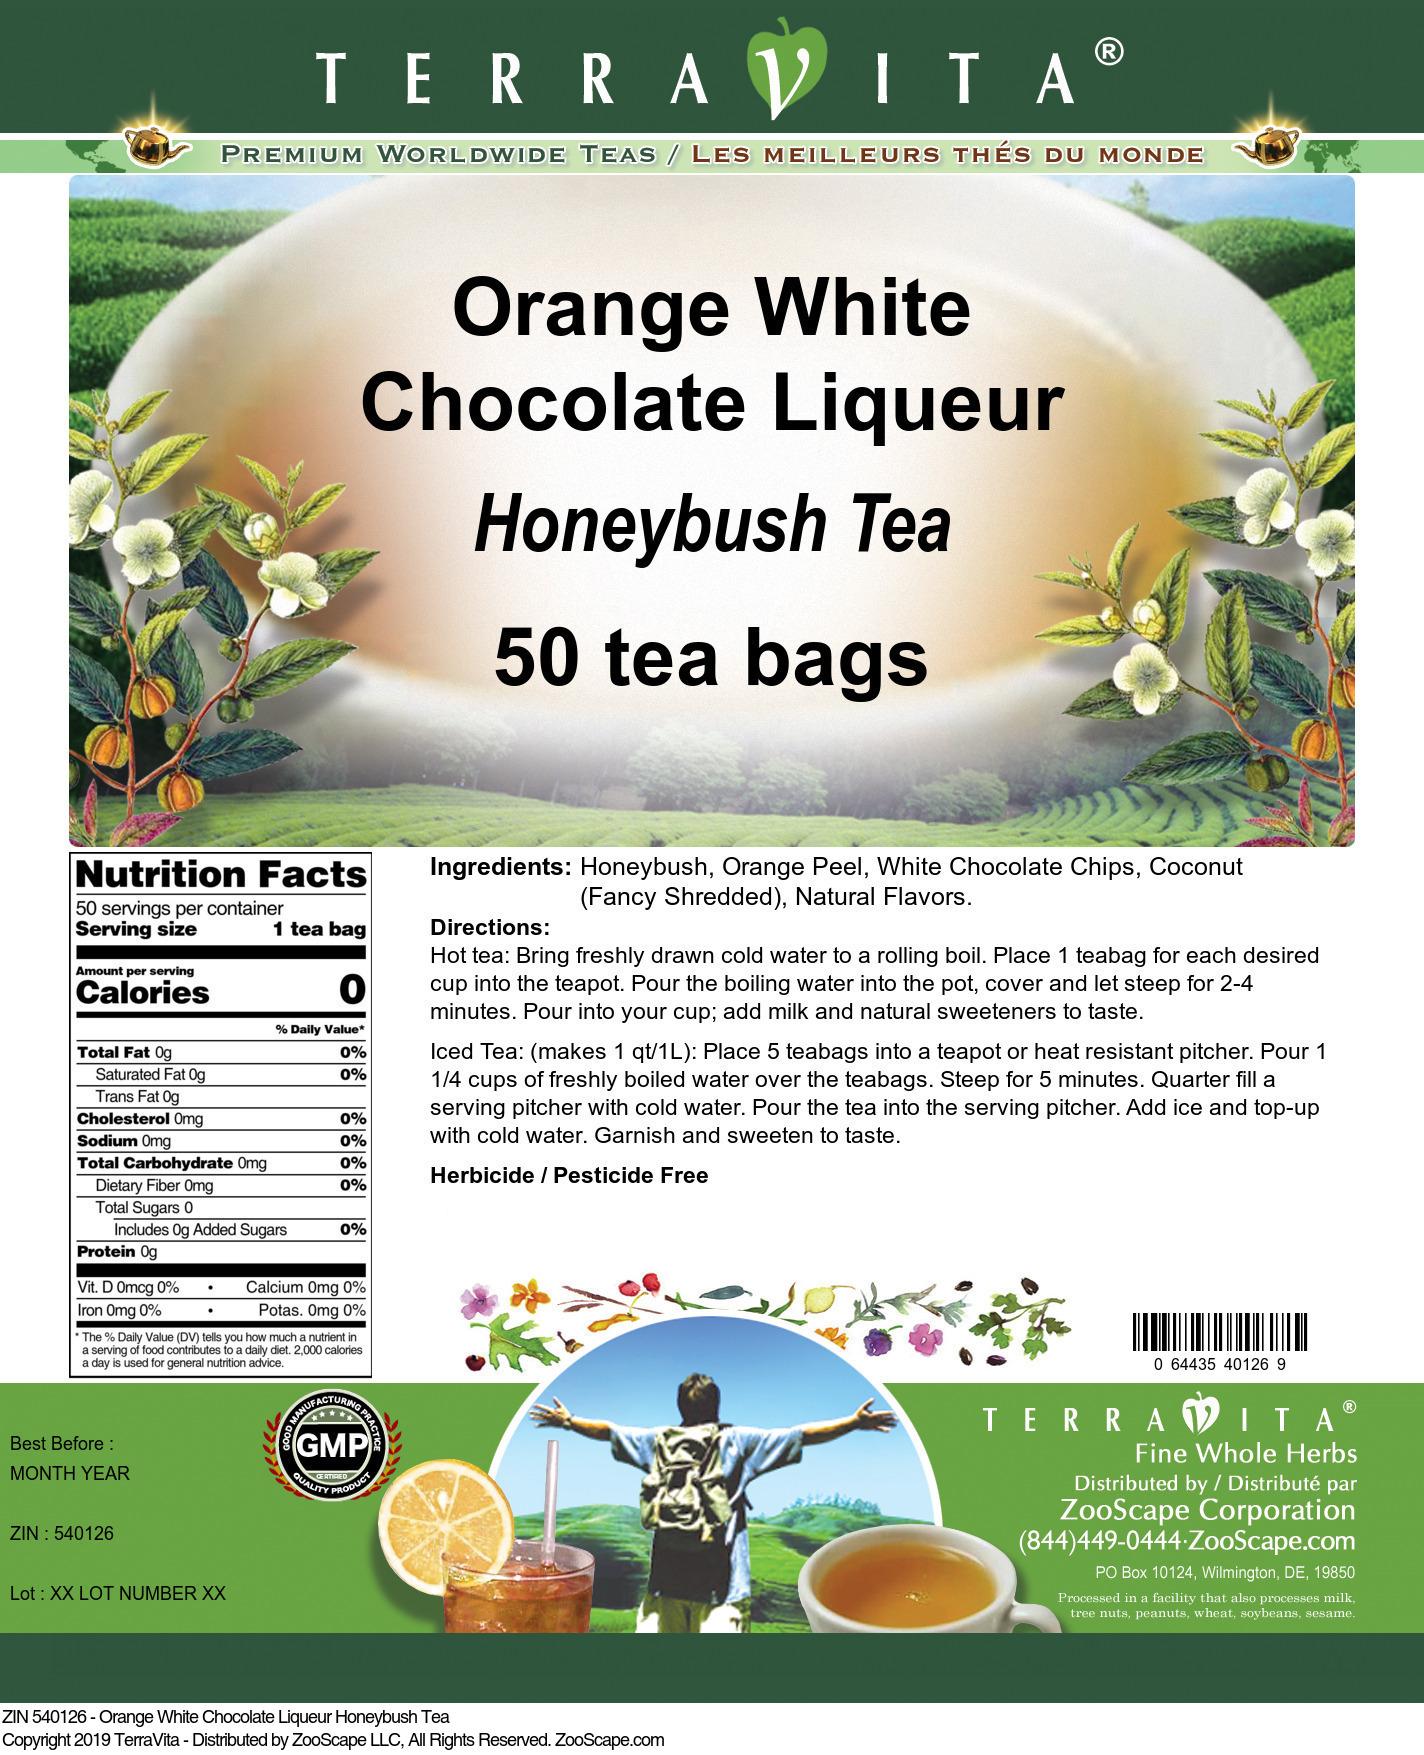 Orange White Chocolate Liqueur Honeybush Tea